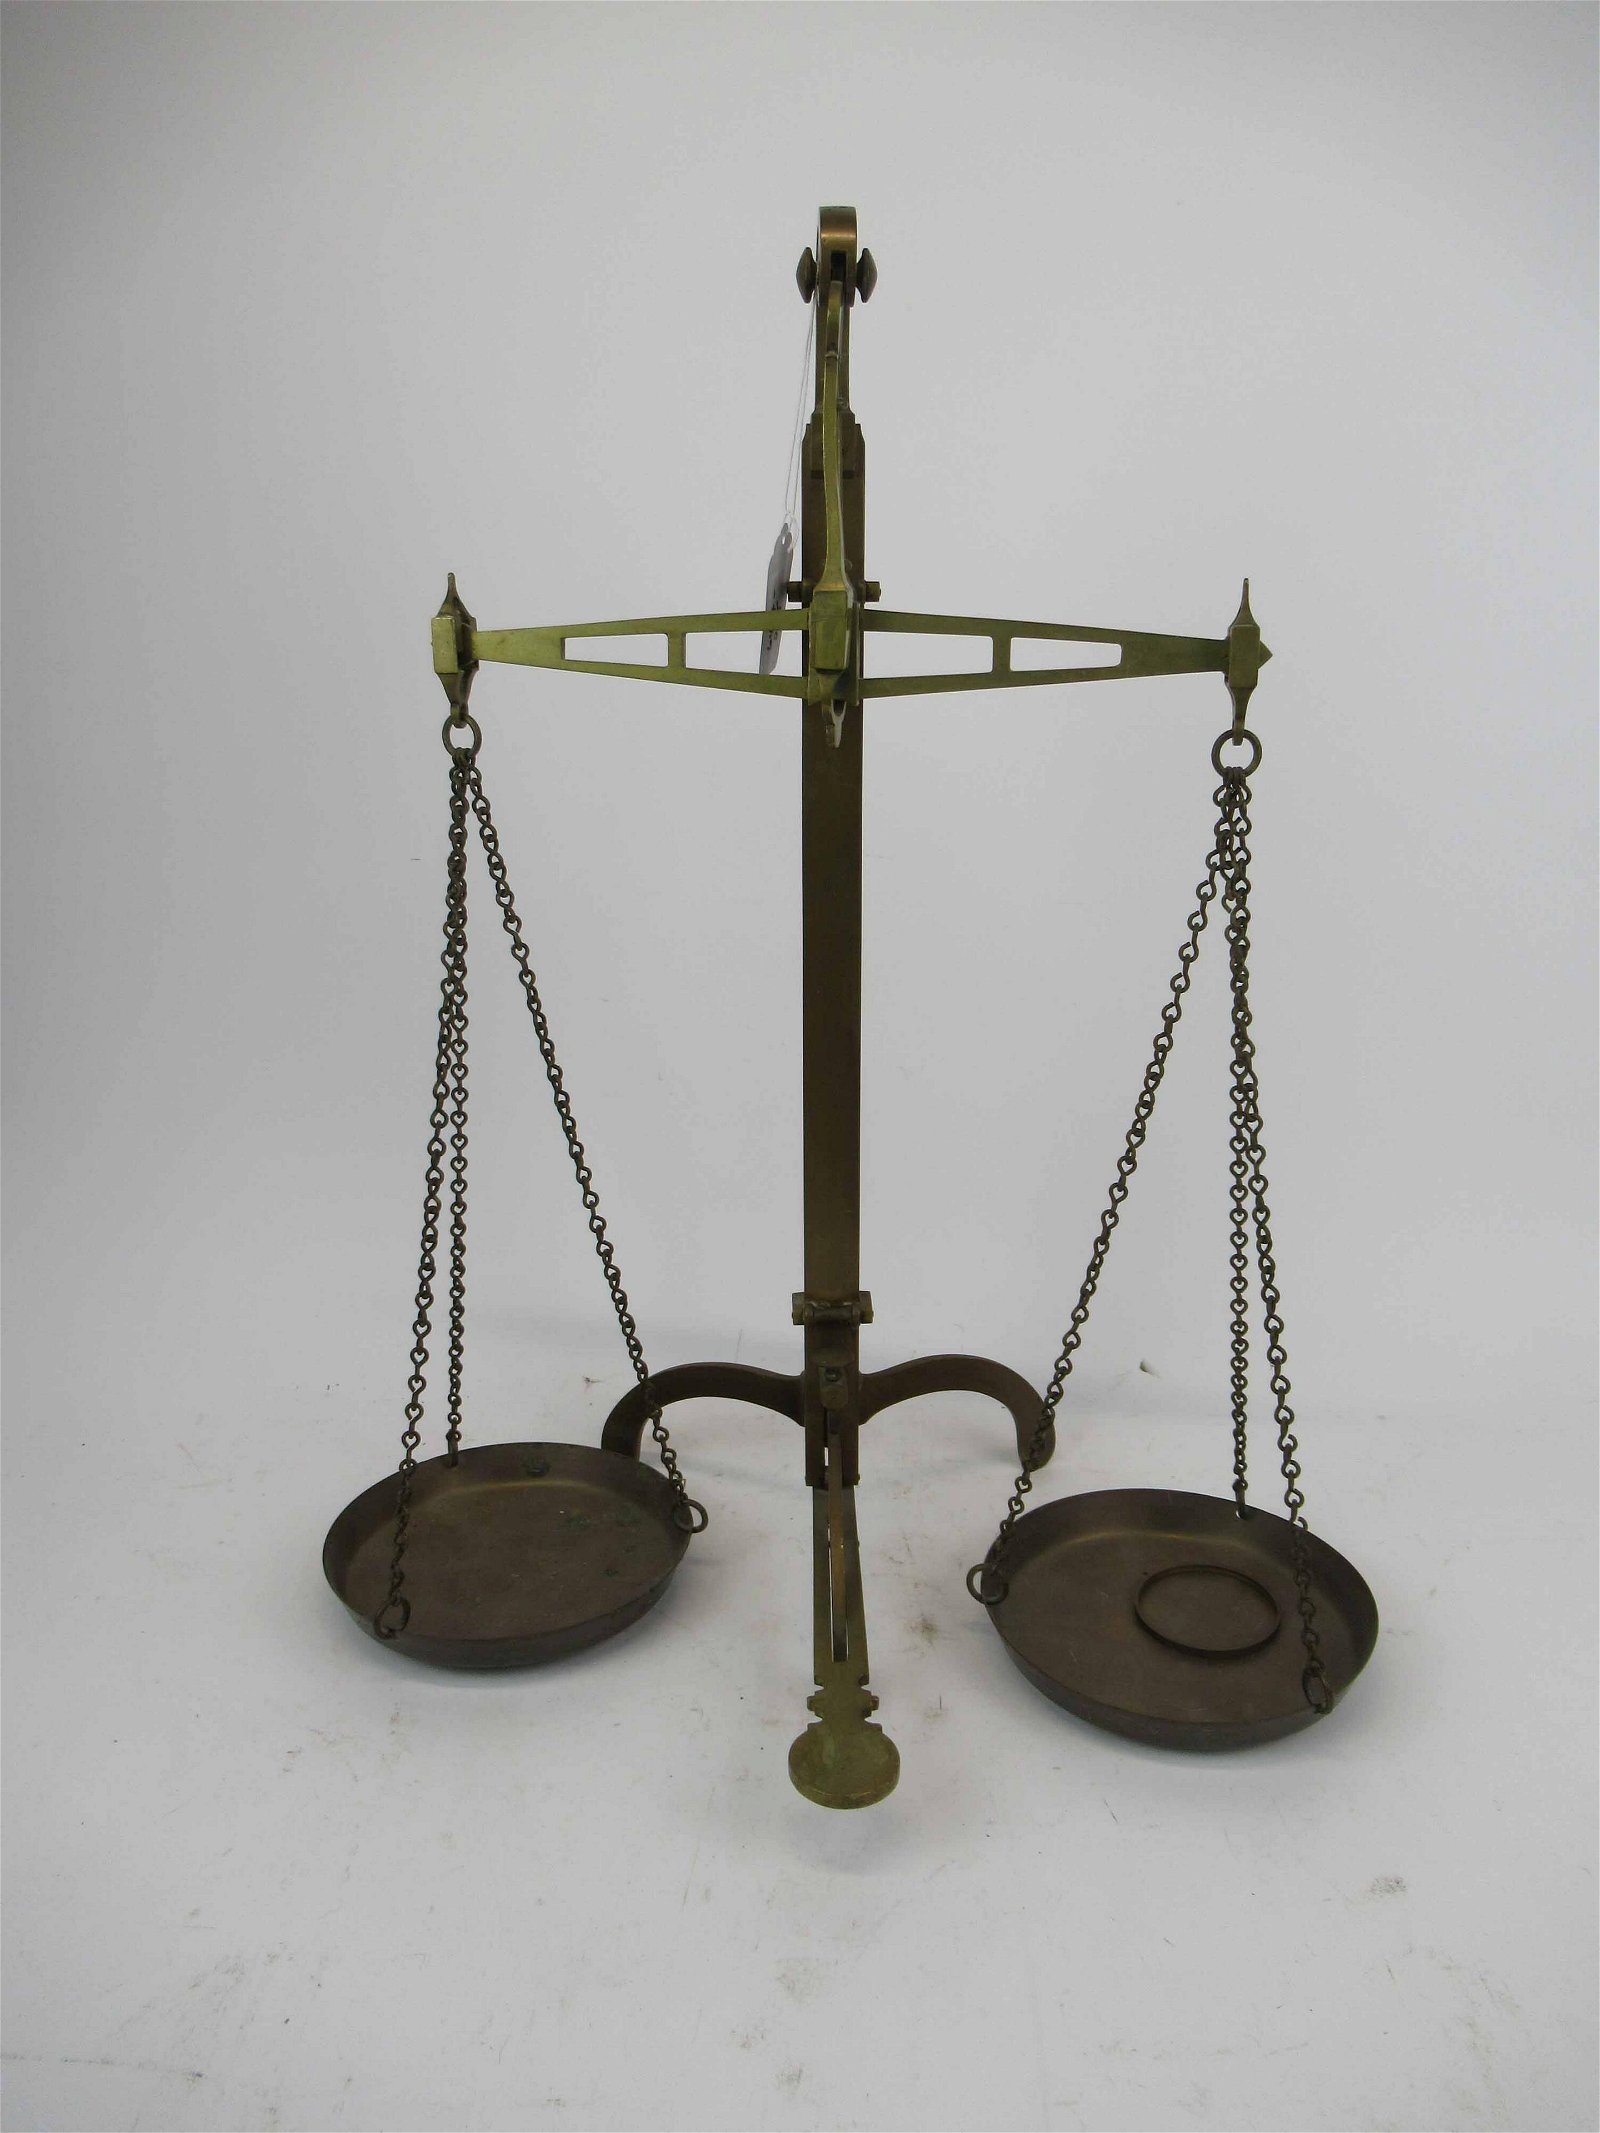 Antique Brass Floor Balance Scale